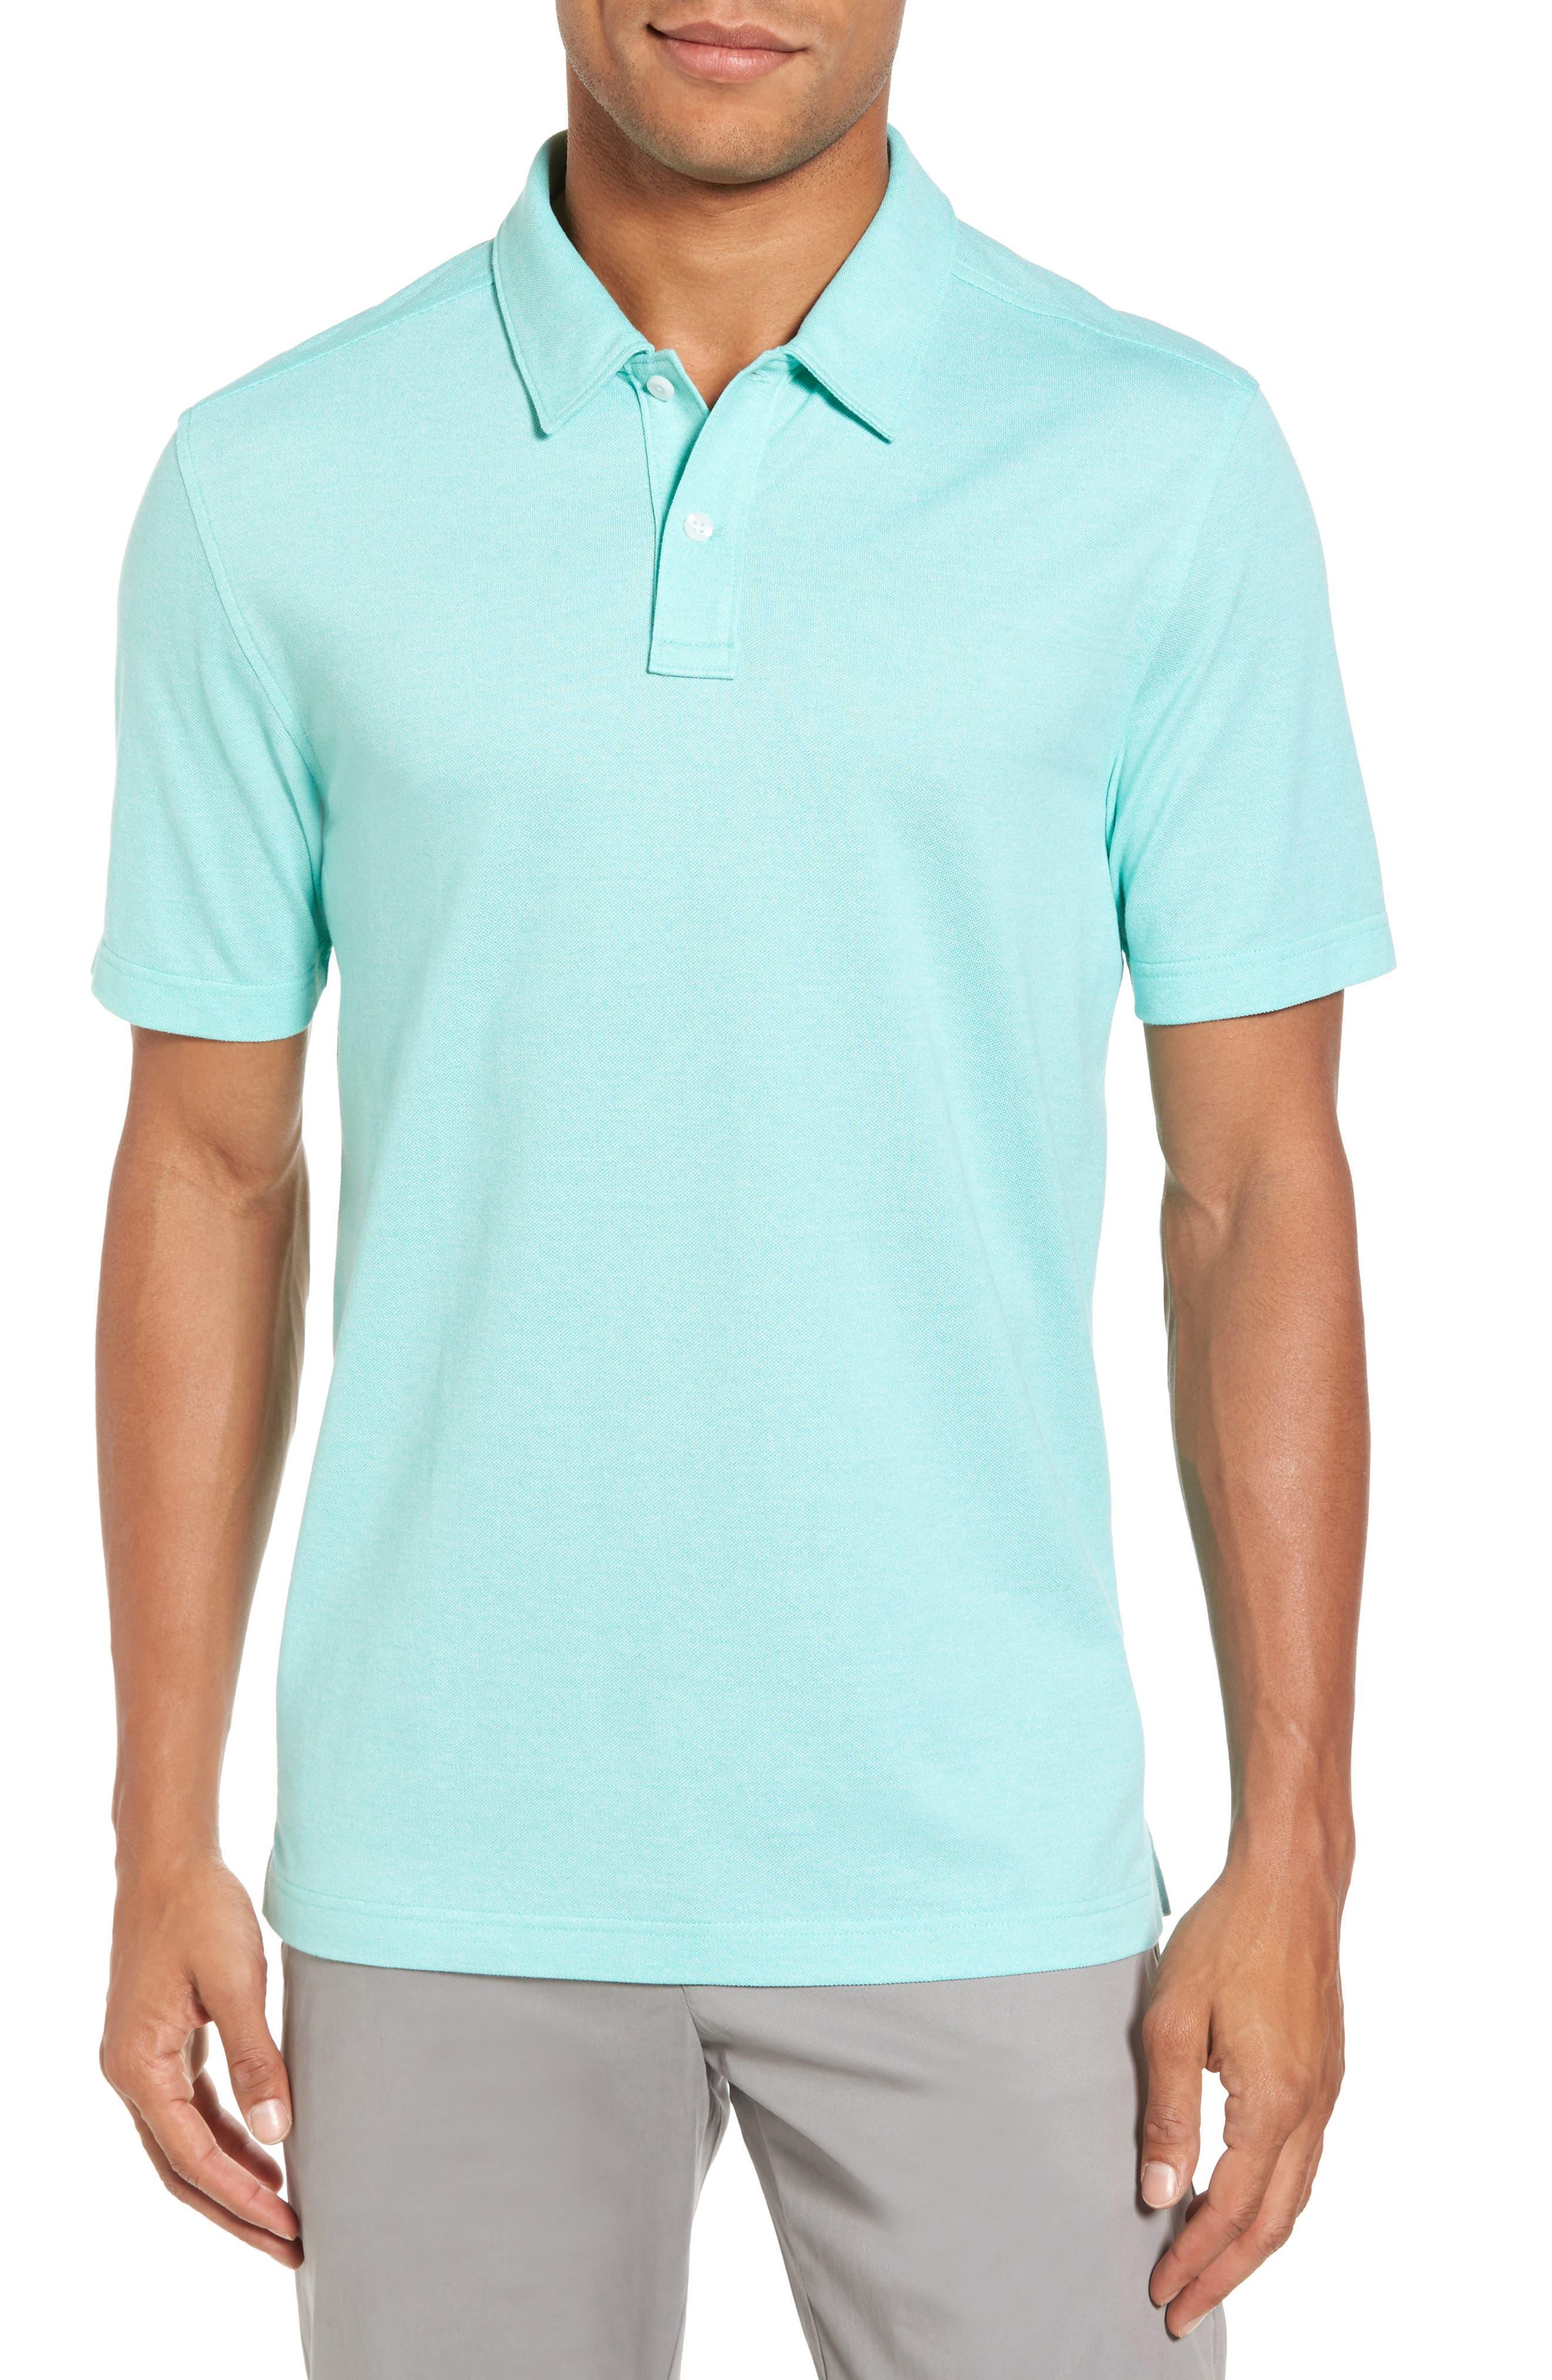 Big & Tall Nordstrom Shop Regular Fit Polo - Blue/green